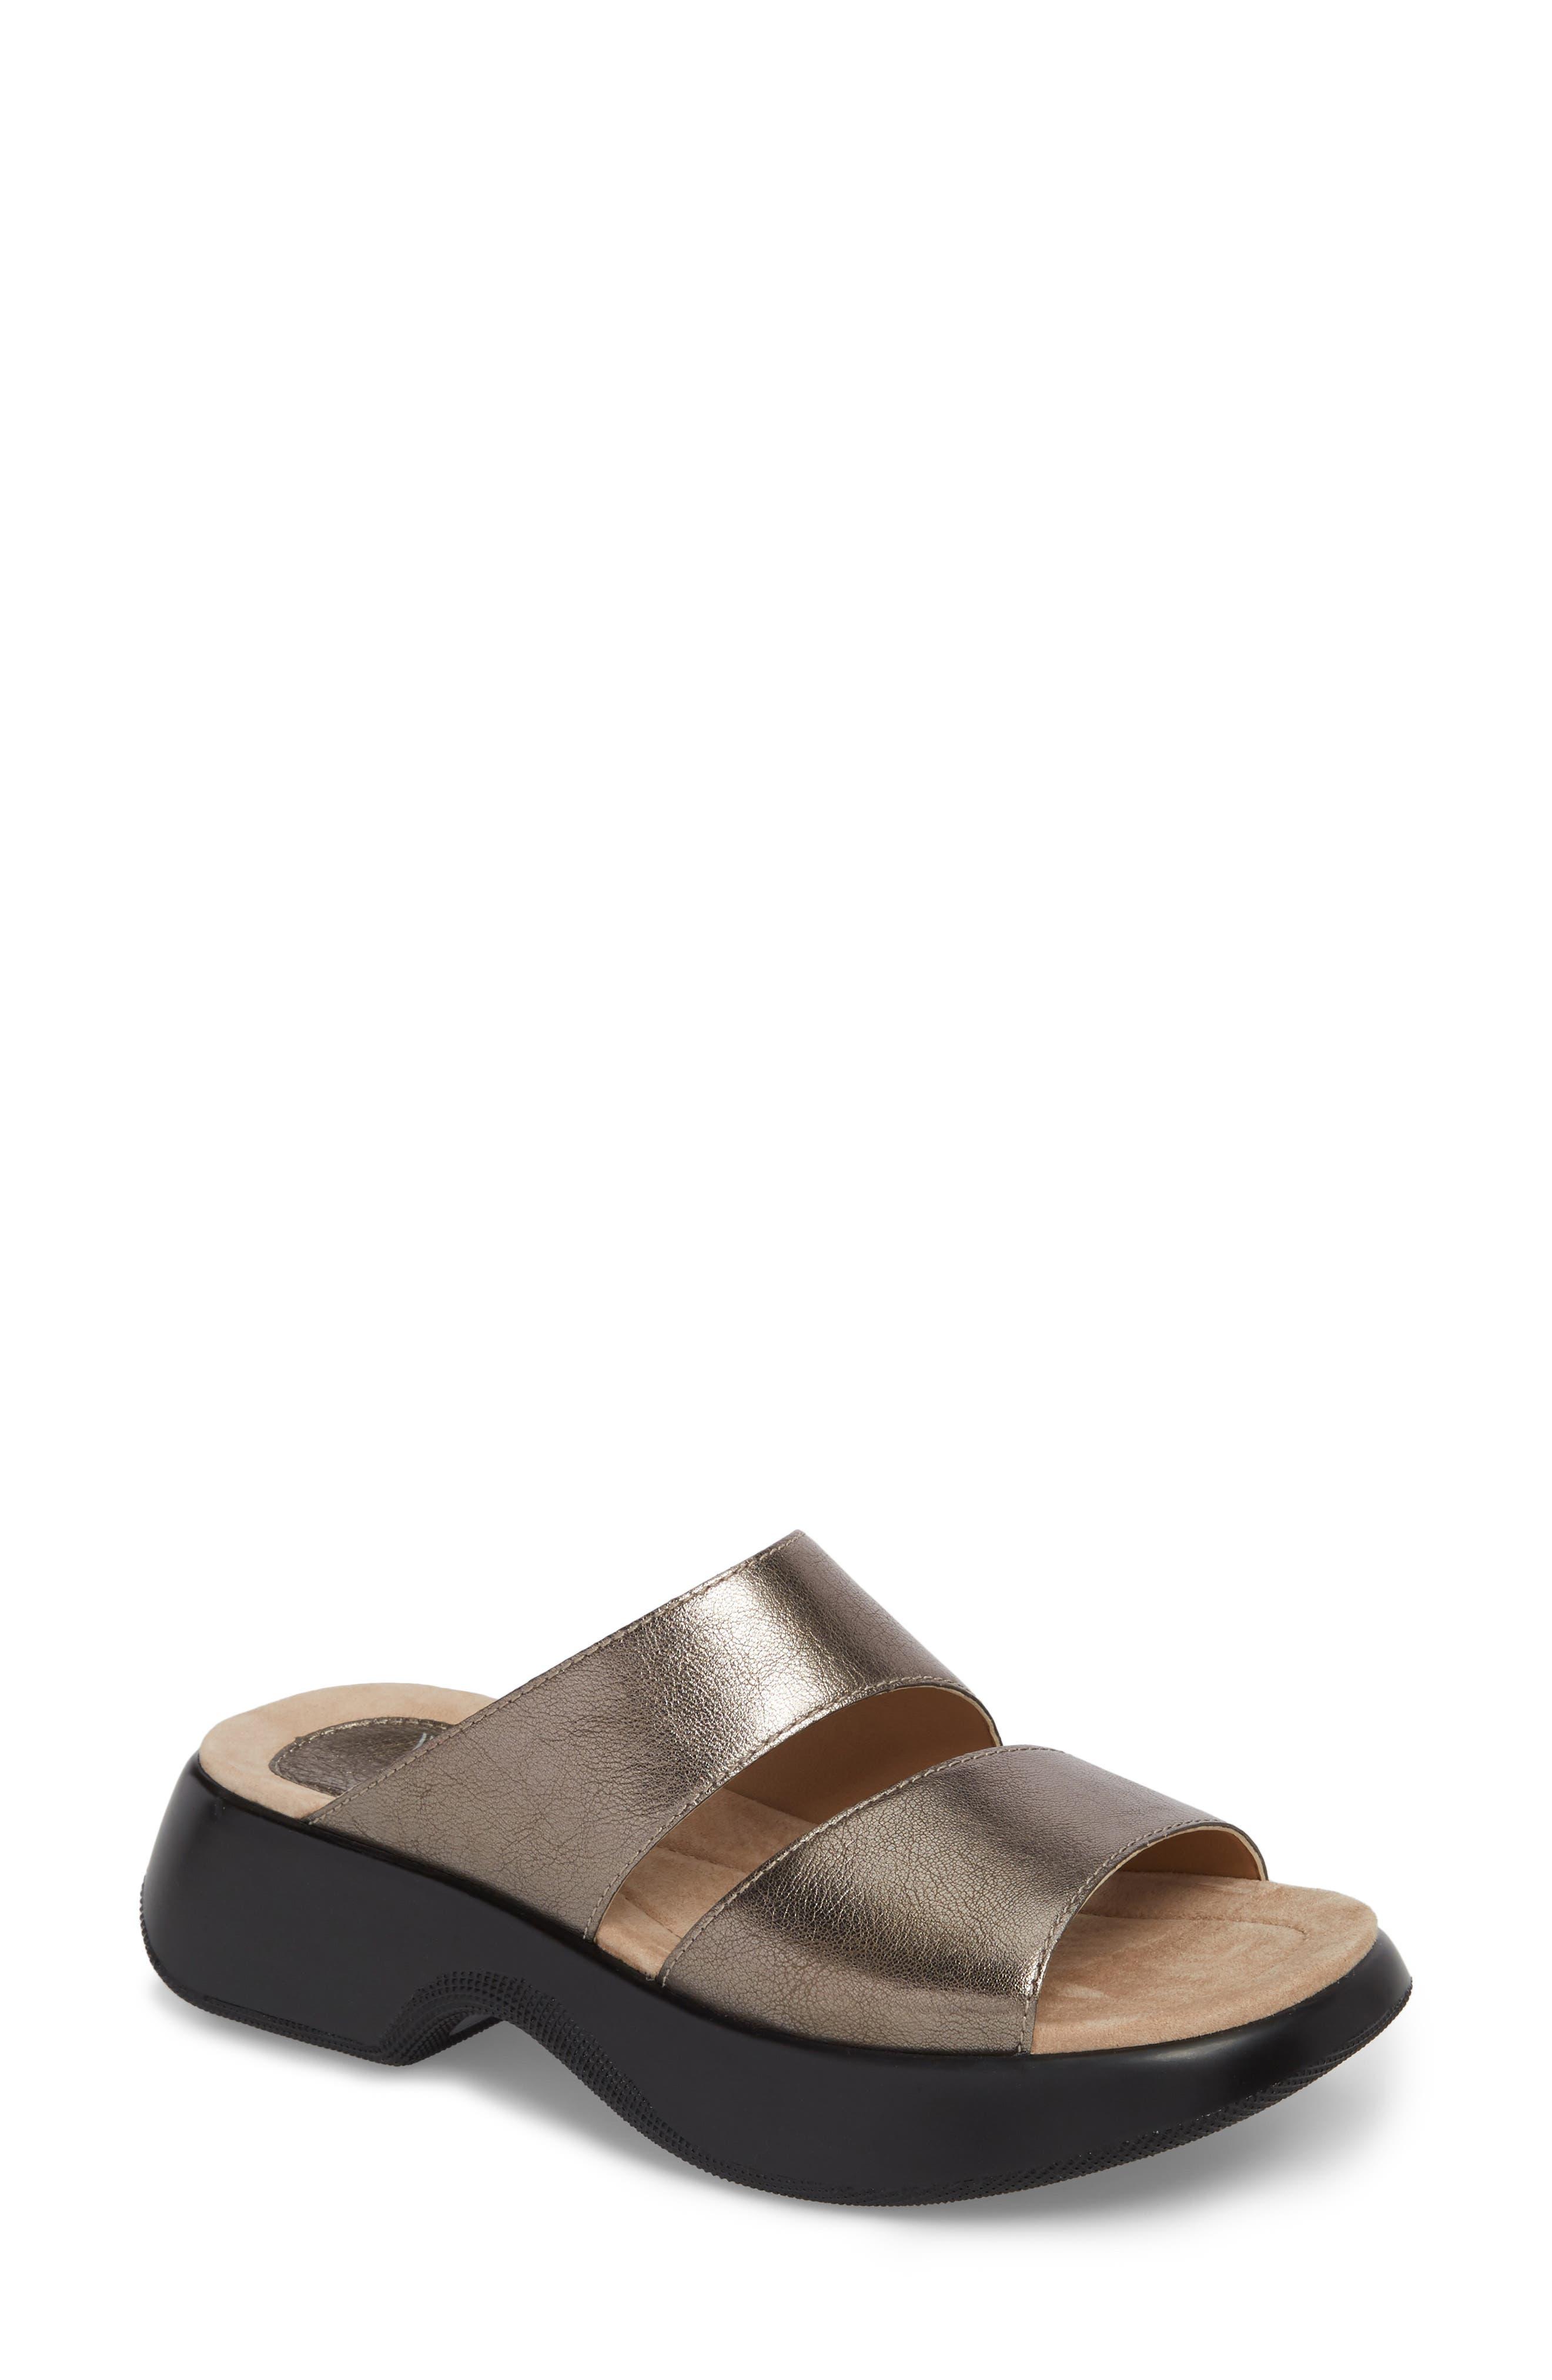 Lana Slide Sandal,                             Main thumbnail 1, color,                             Pewter Leather